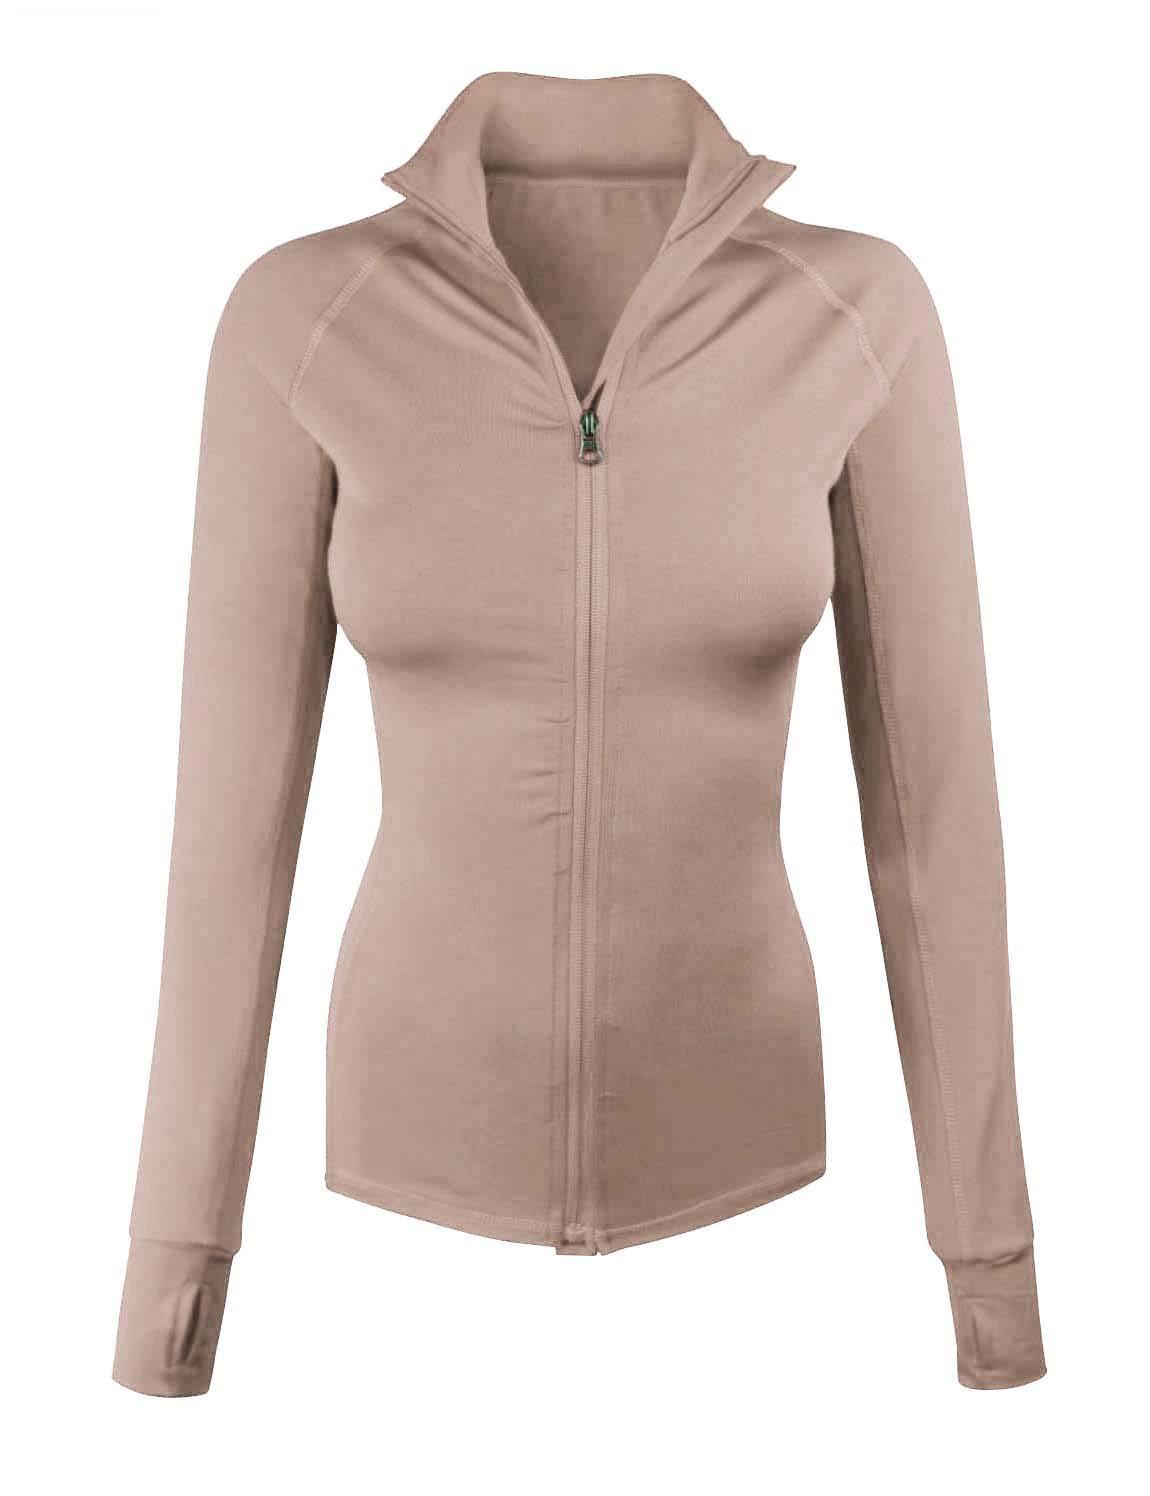 makeitmint Women's Comfy Zip Up Stretchy Work Out Track Jacket w/Back Pocket Small YJZ0002_02KHAKI